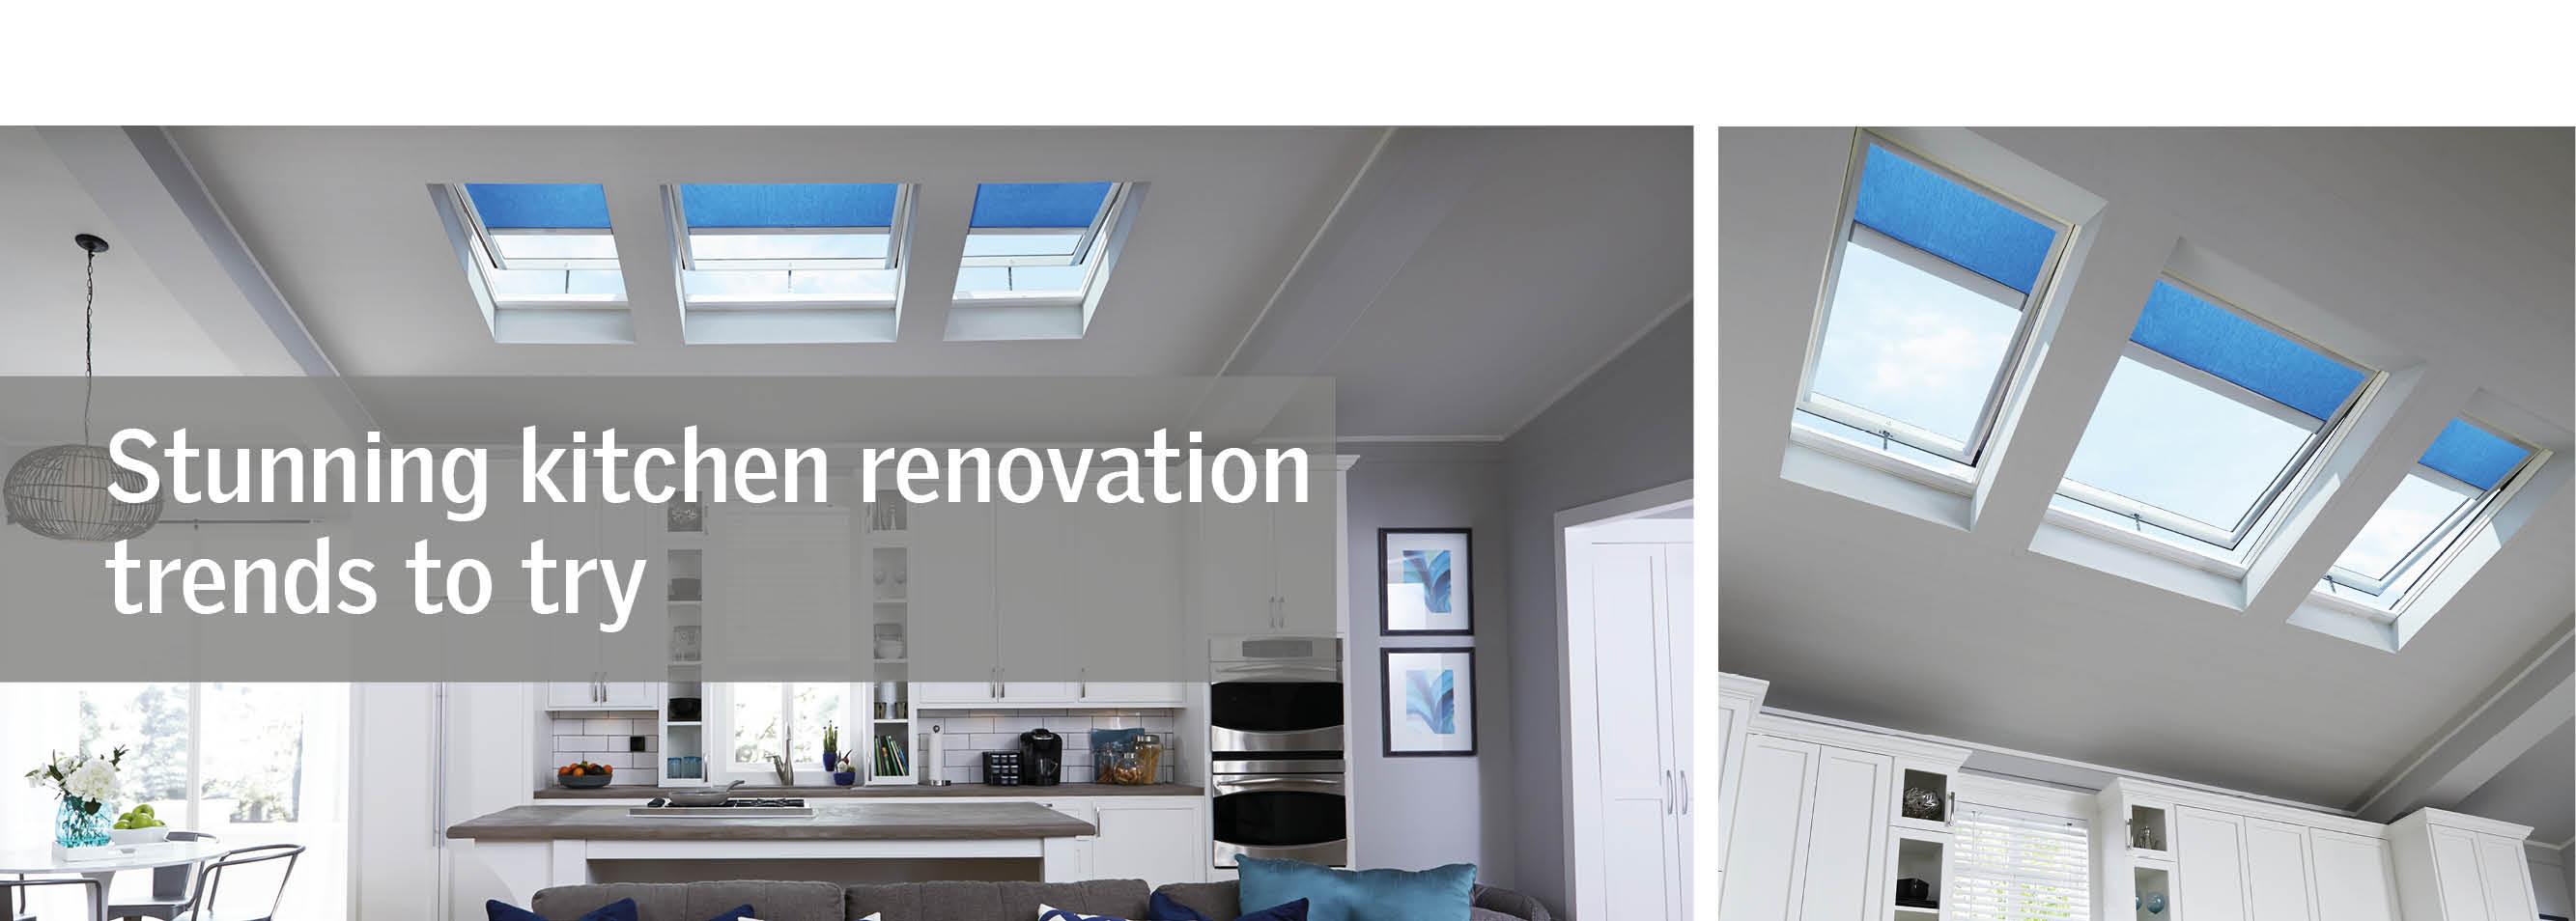 Stunning kitchen renovation trends to try - Hero-1.jpg